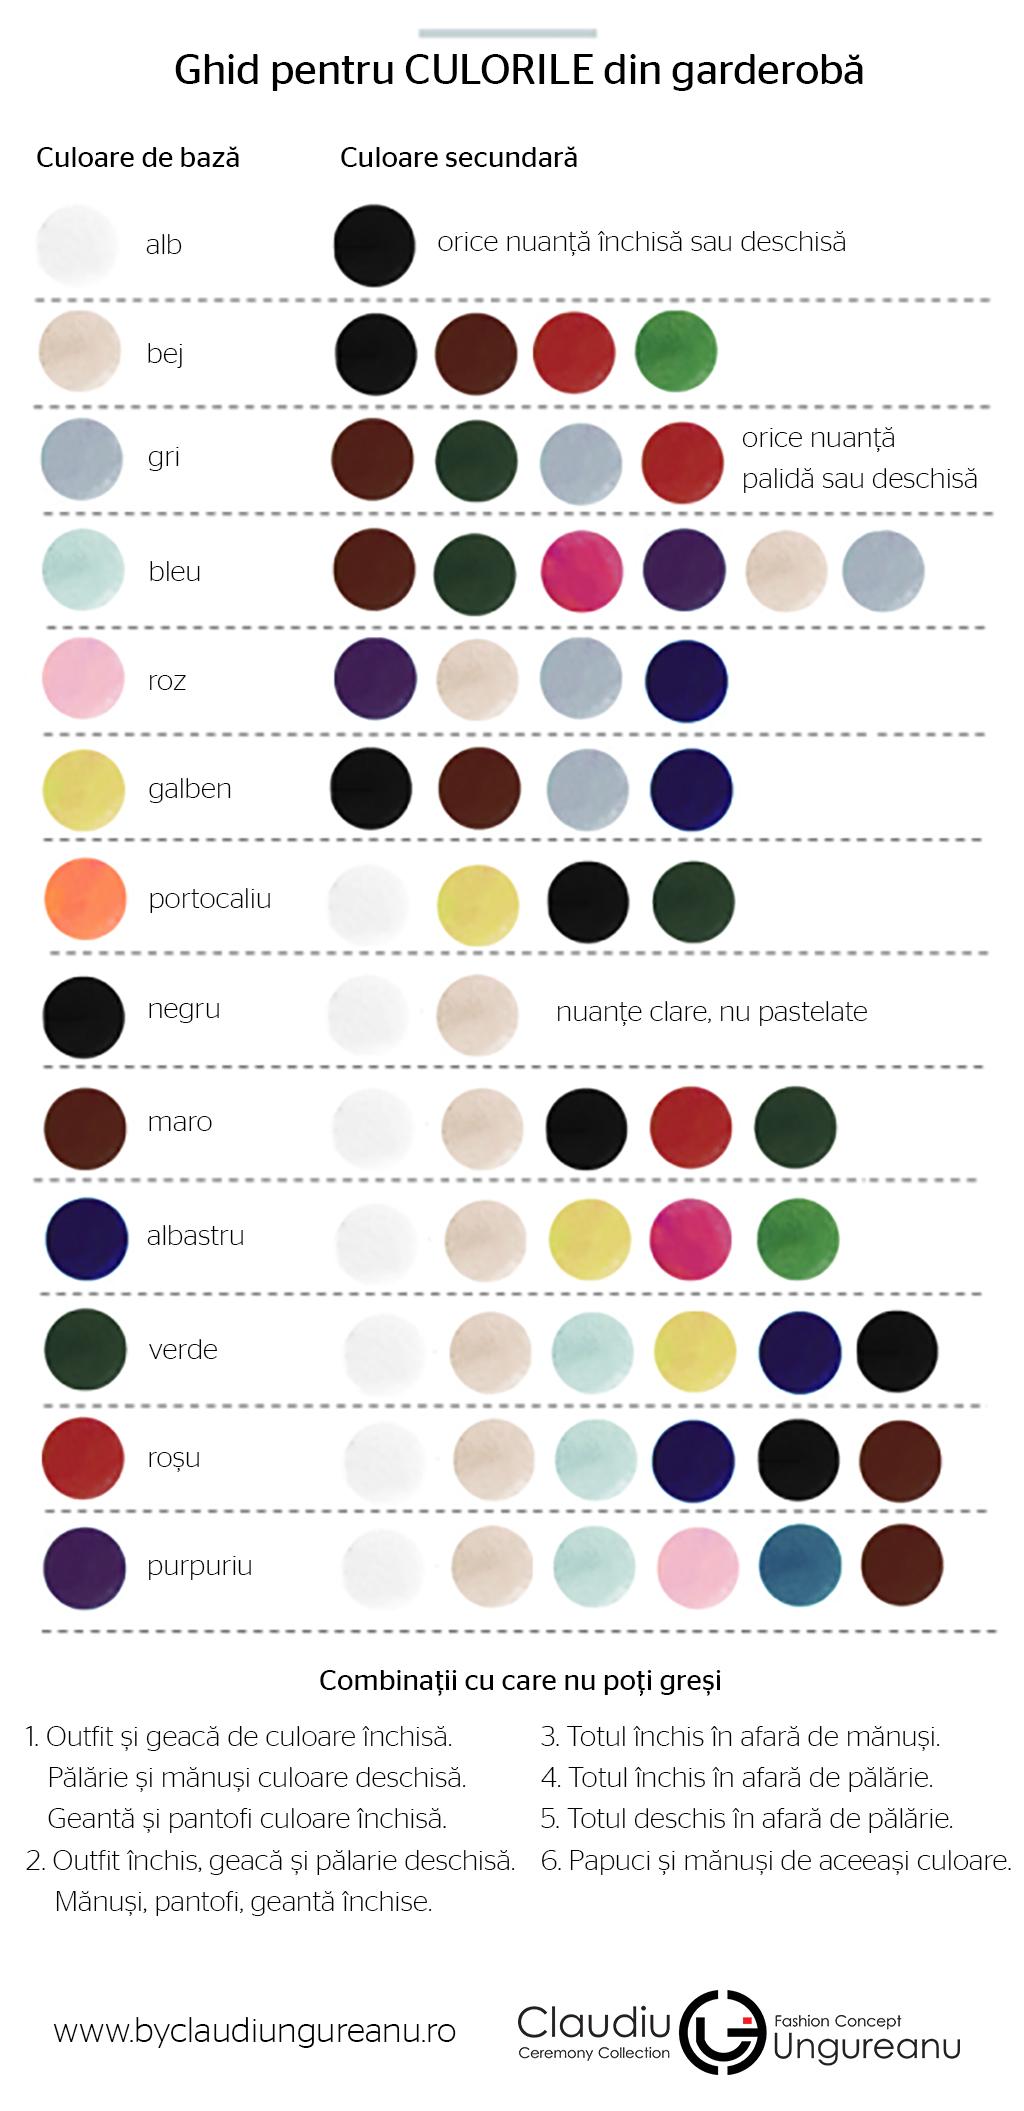 ghid-culori-garderoba